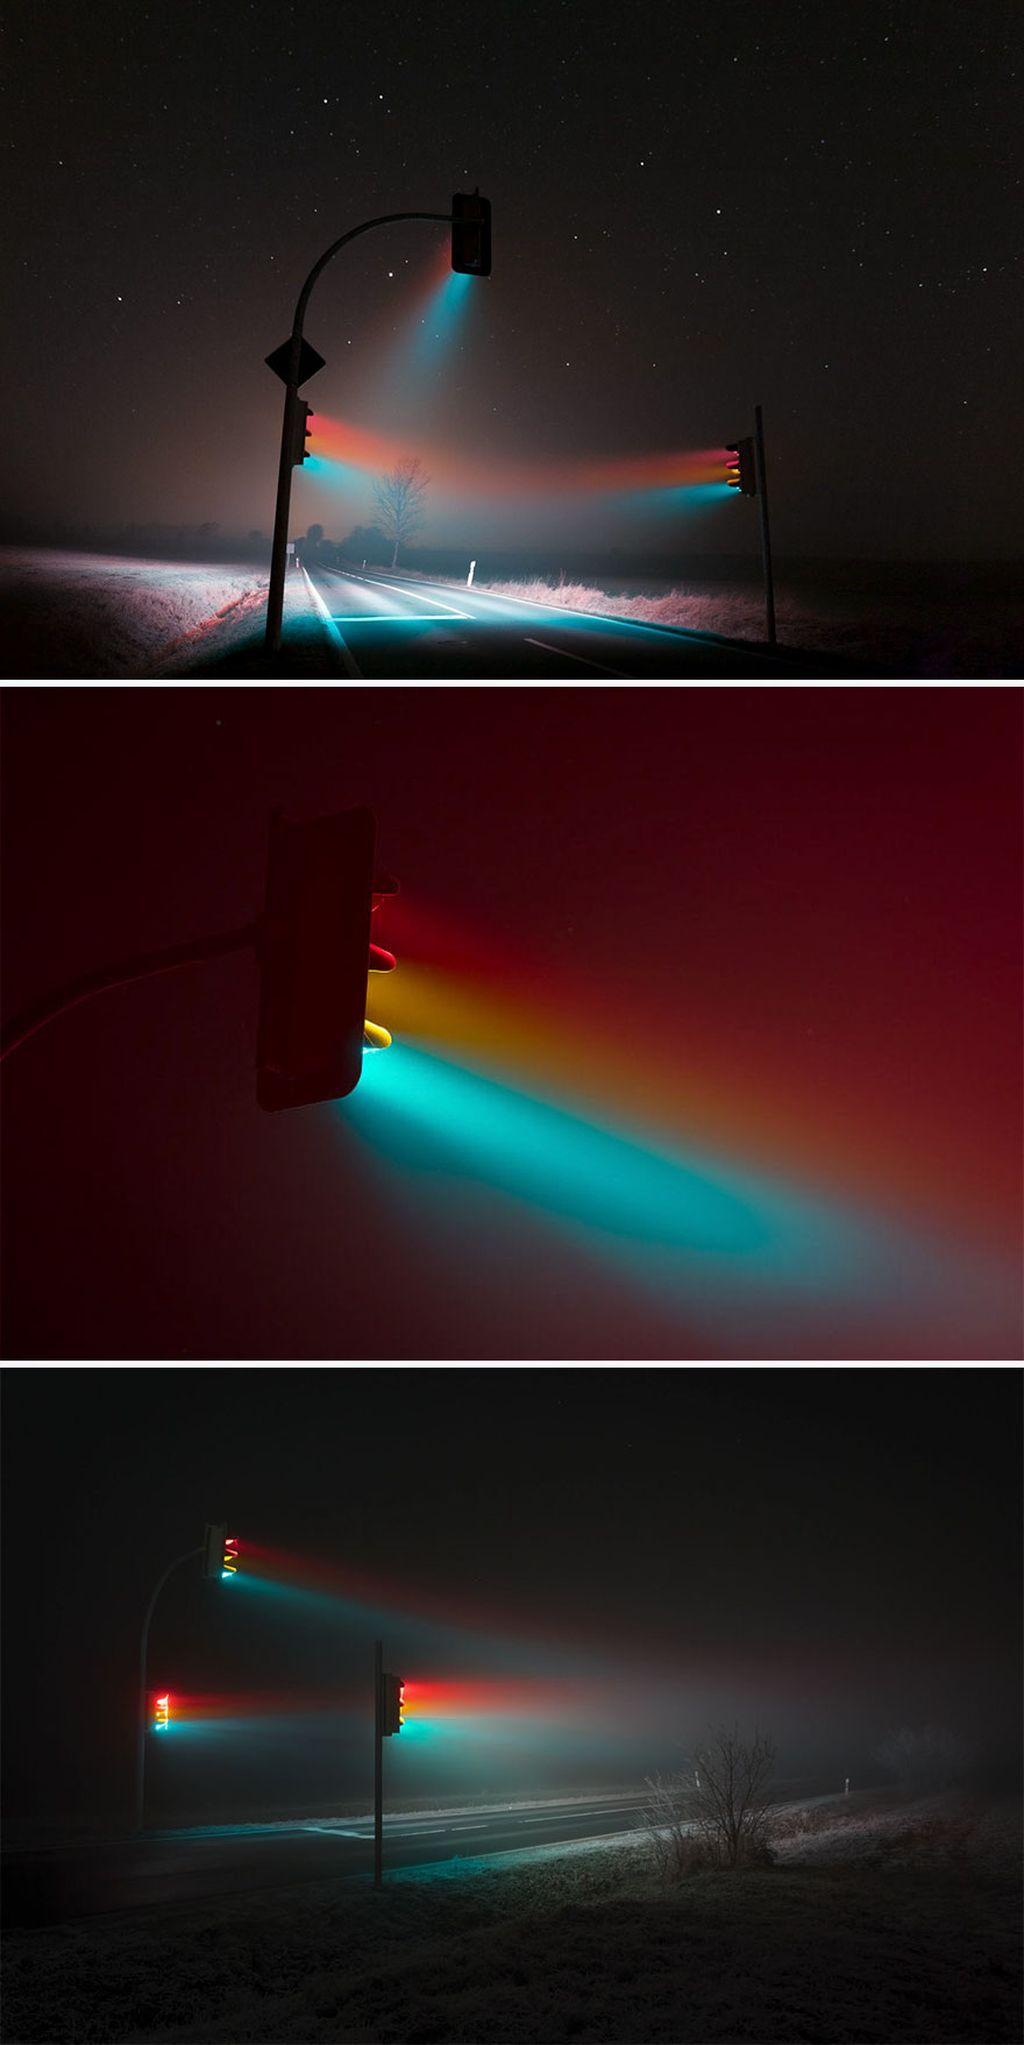 Cahaya dari lampu jalan, perpaduan warna merah, hijau, kuning yang membuatnya indah. (Foto:Lucas Zimmermann/boredpanda)